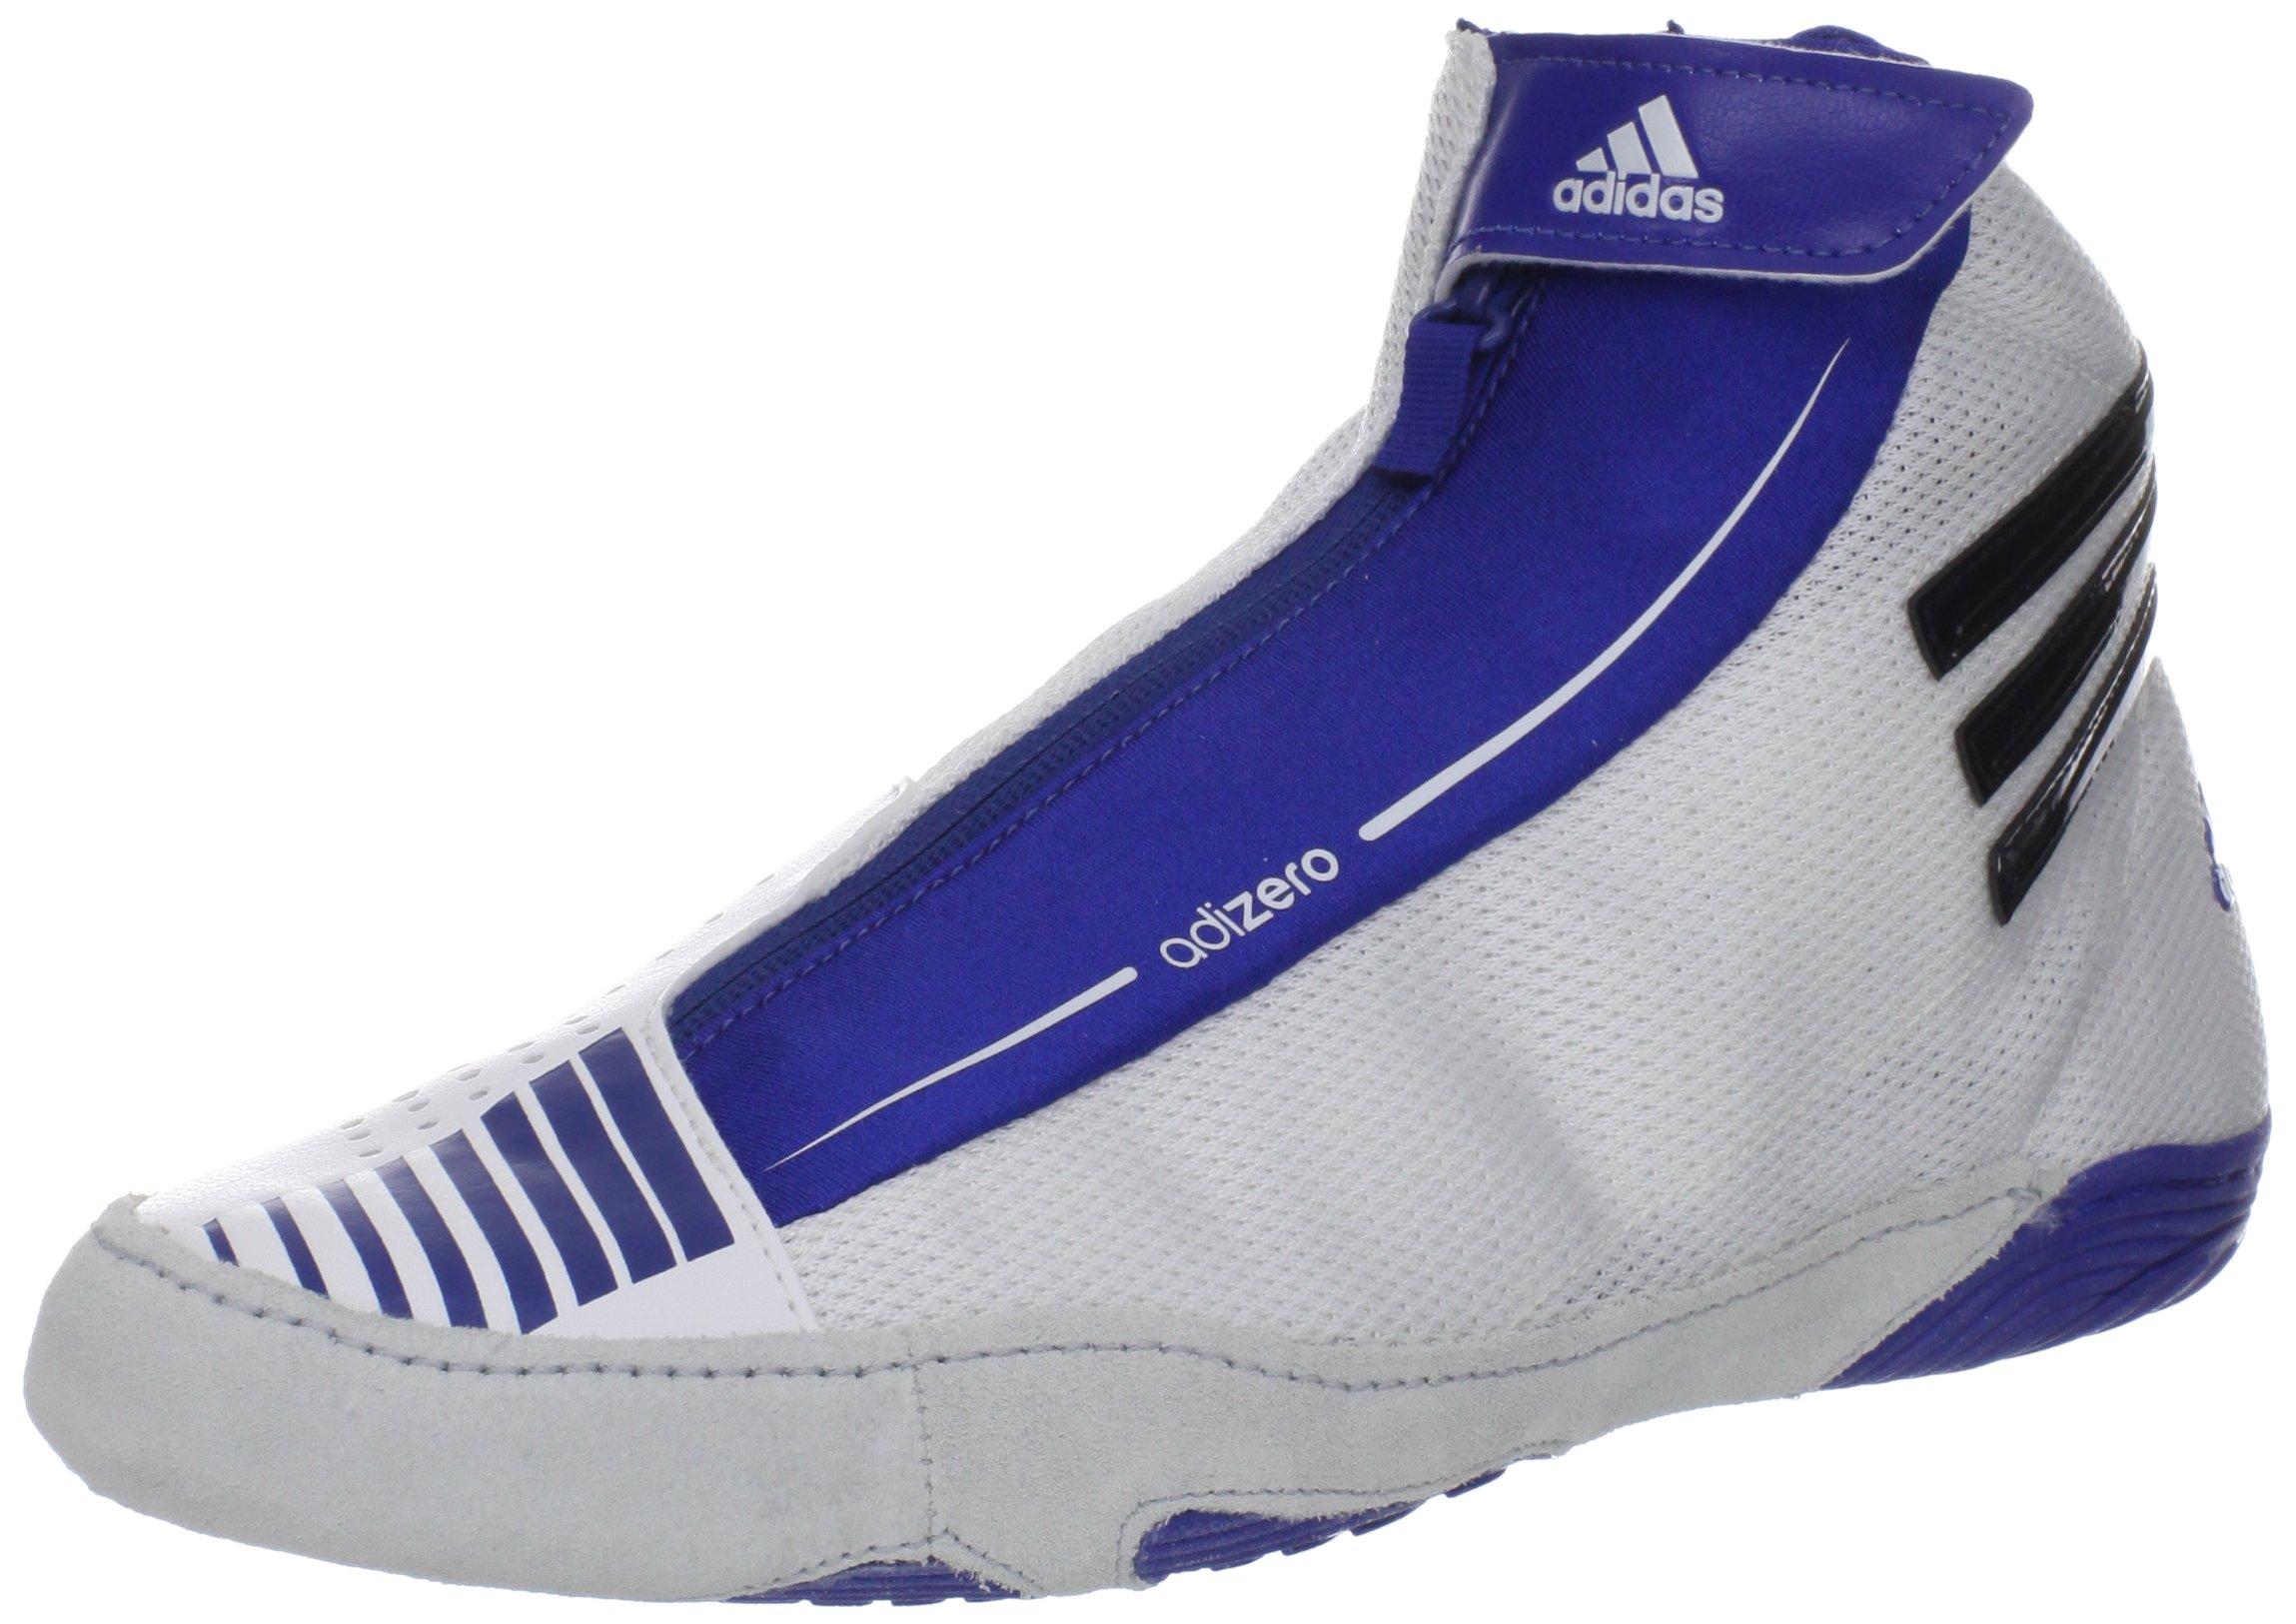 adidas Wrestling Men's Adizero Sydney Wrestling Shoe,White/Black/Royal Blue,11.5 M US by adidas